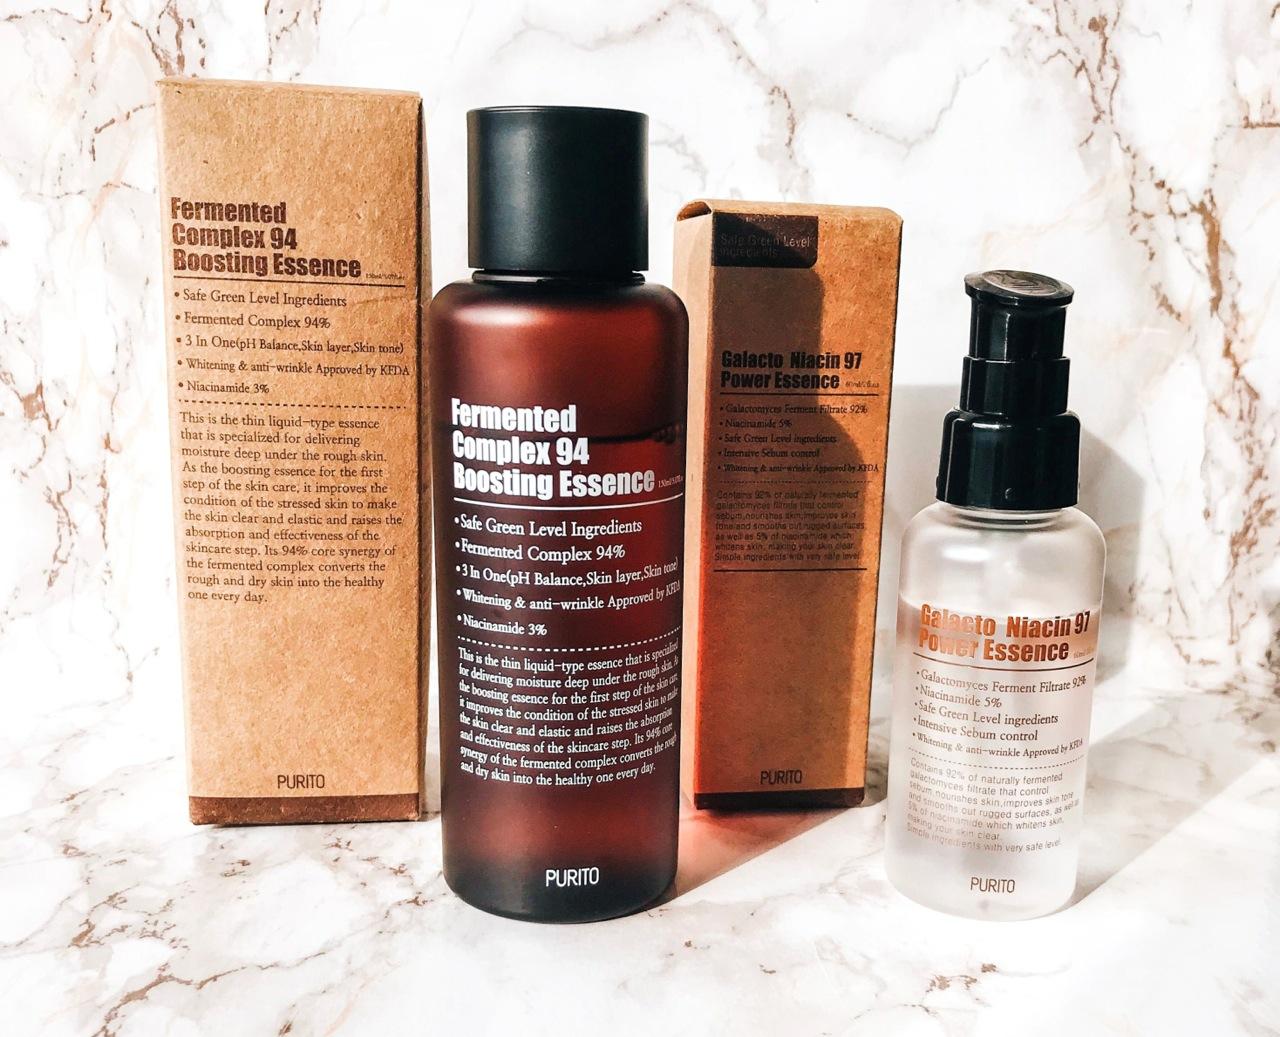 Purito skincare Korean beauty review